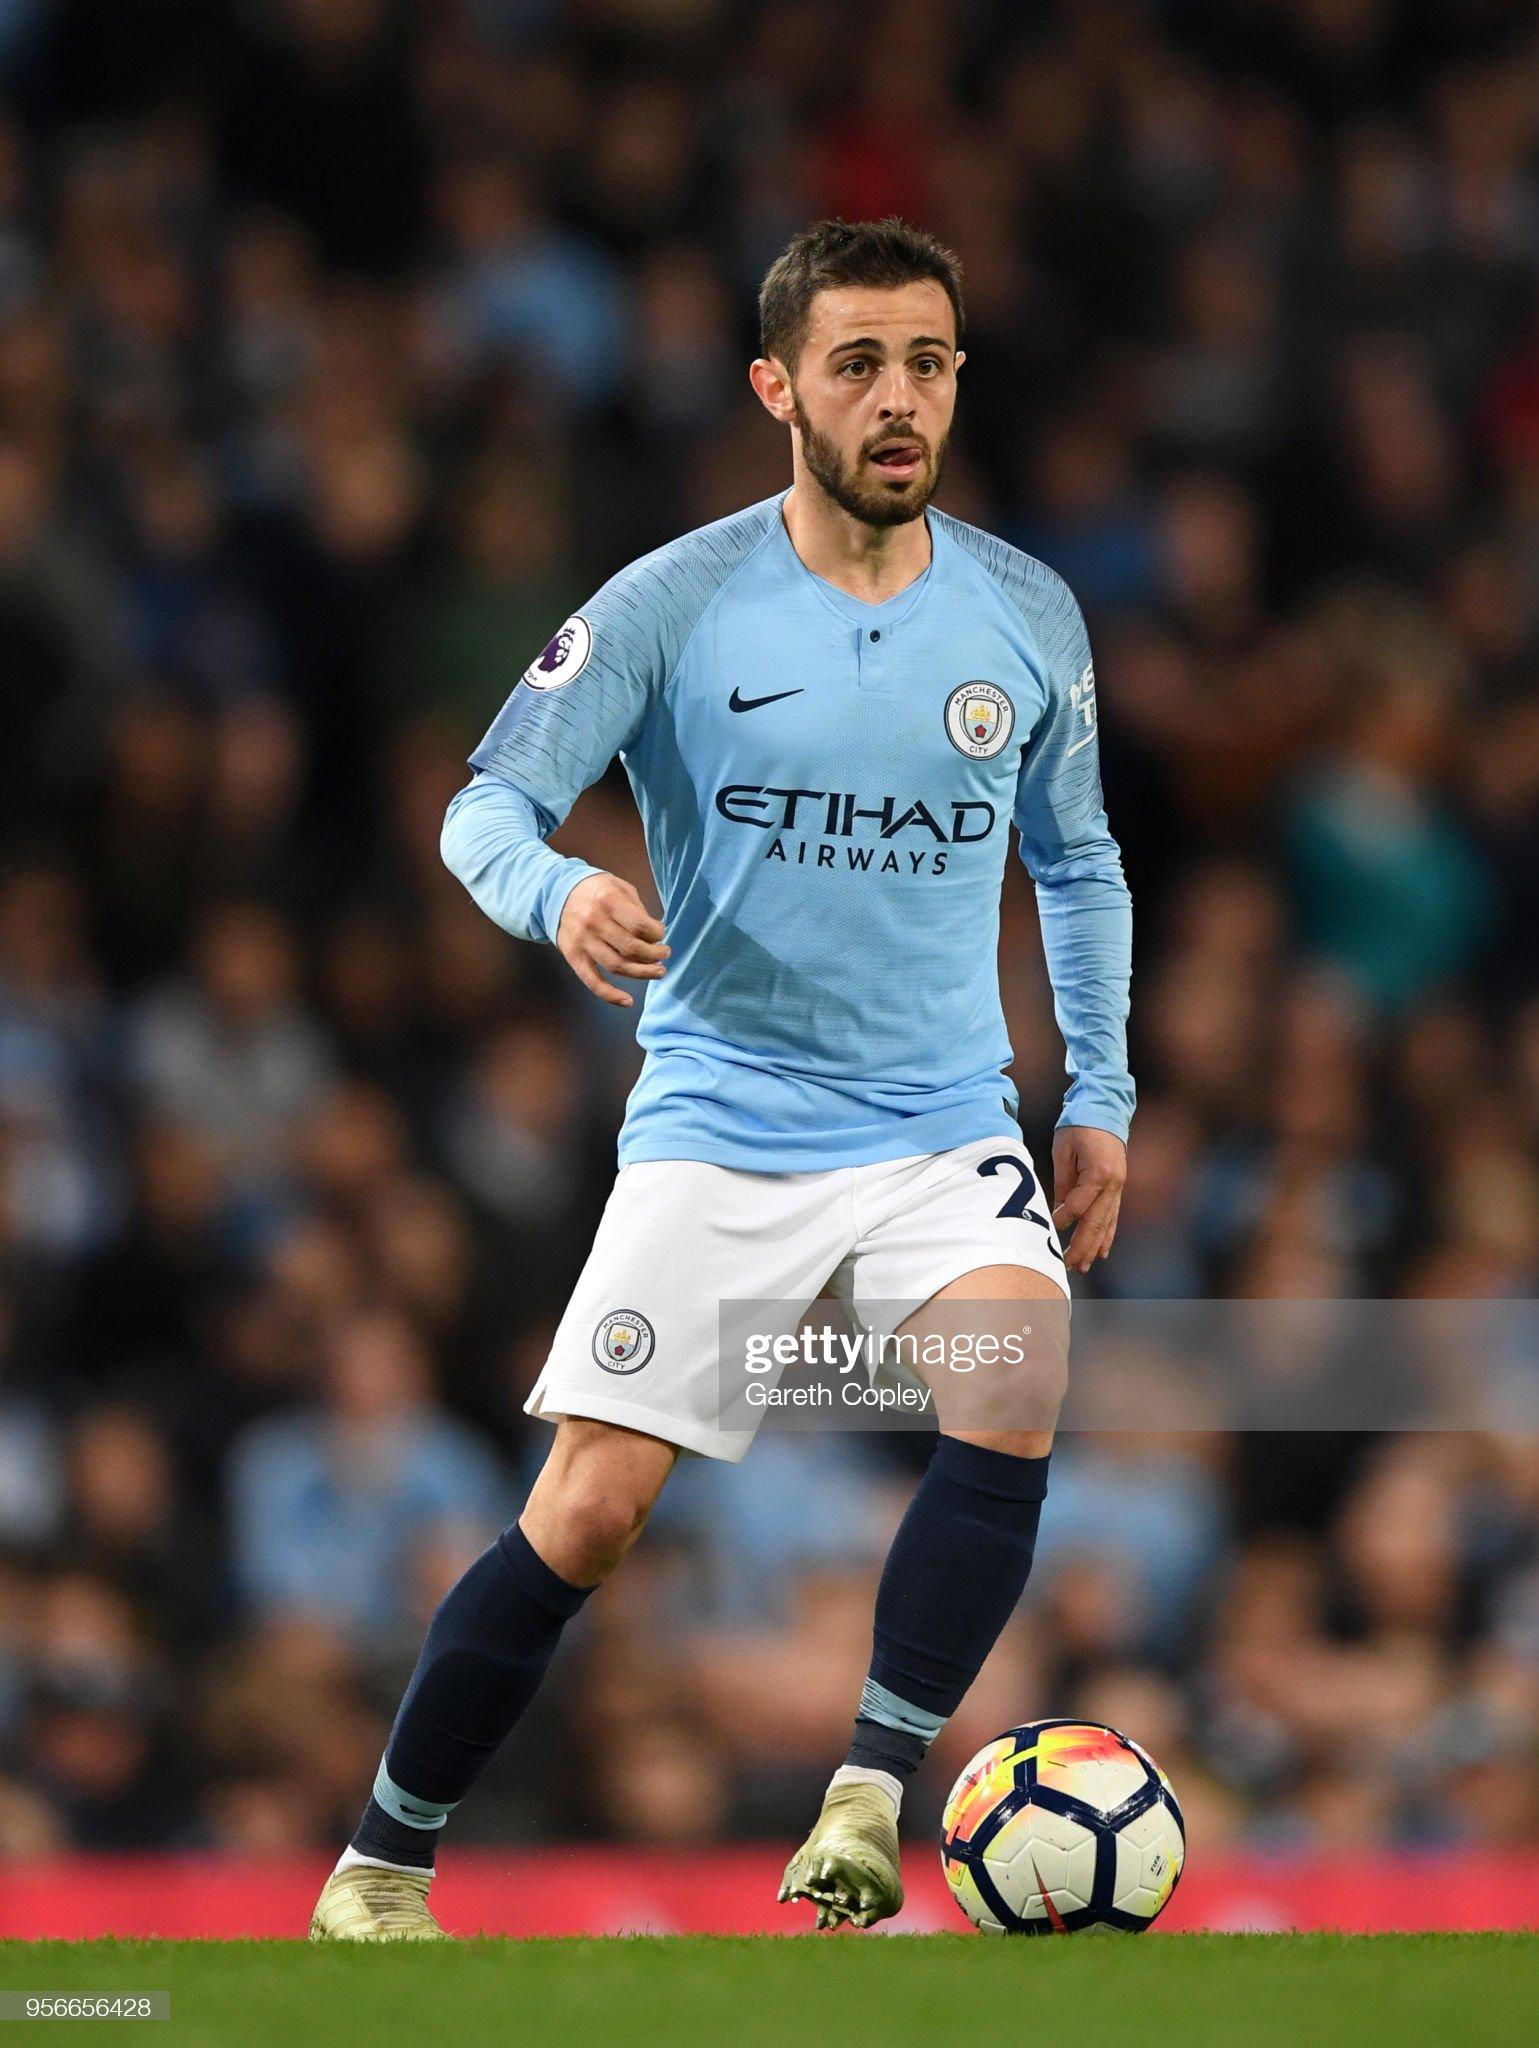 ¿Cuánto mide Bernardo Silva? - Altura real: 1,70 - Real height Bernardo-silva-of-manchester-city-during-the-premier-league-match-picture-id956656428?s=2048x2048